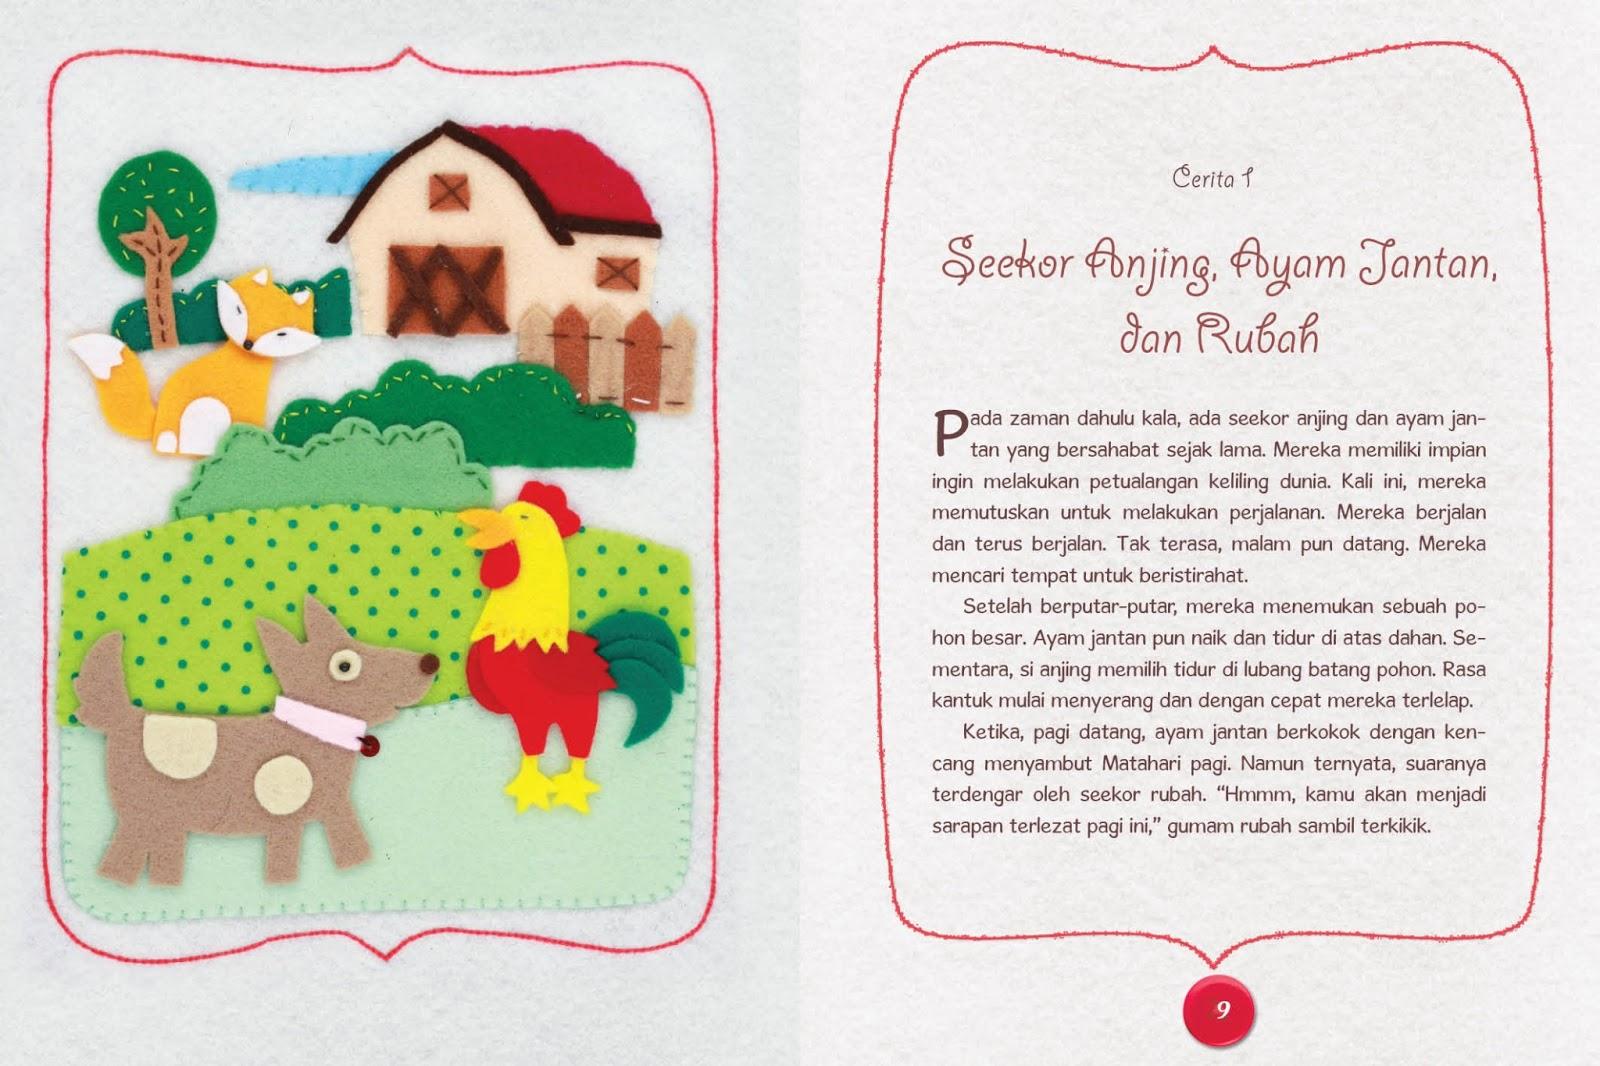 Kumpulan Cerita Fabel Versi Bahasa Jawa Contoh Lbe